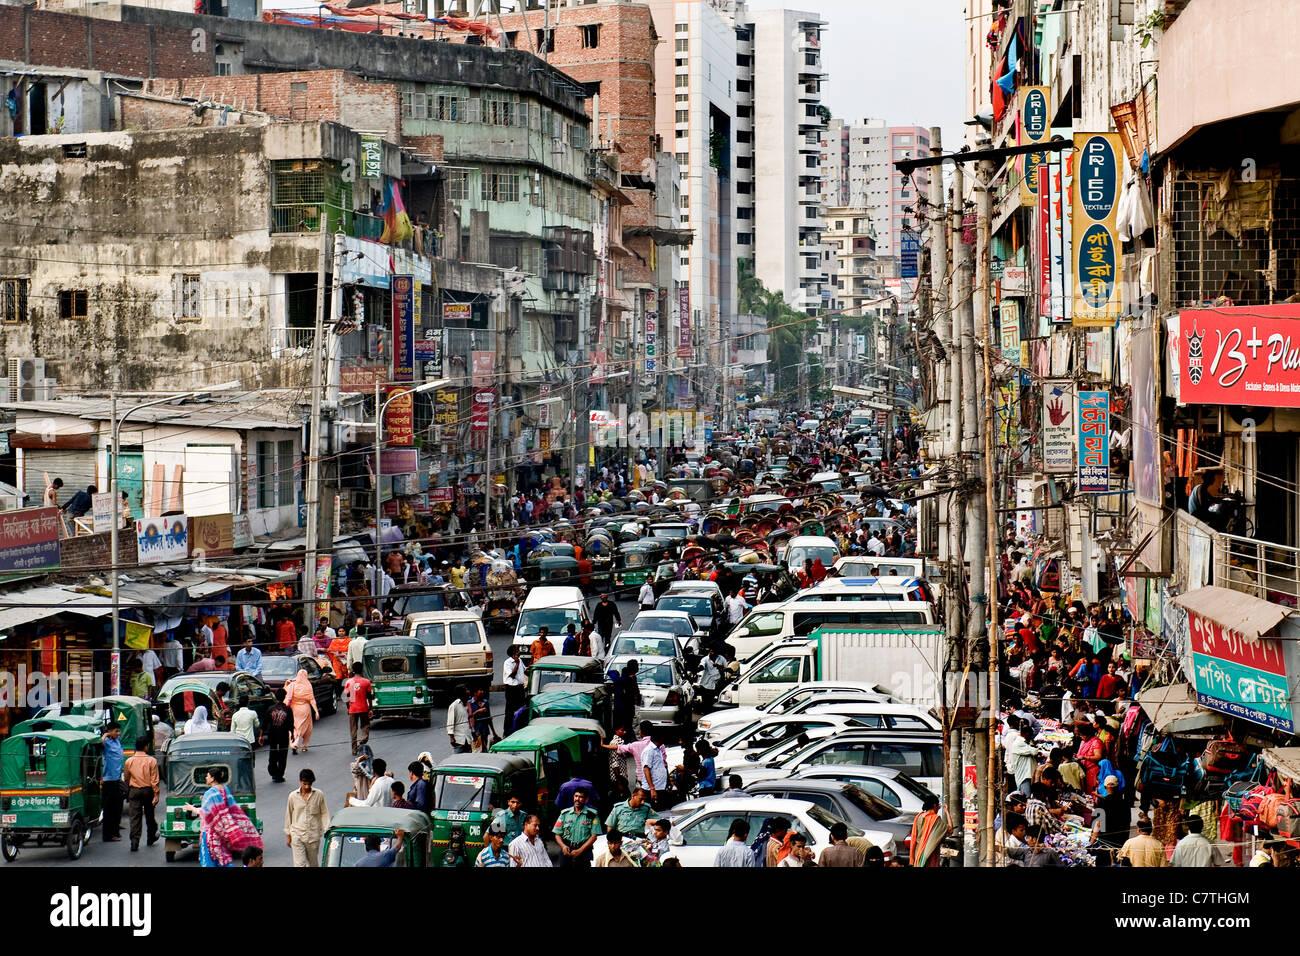 Bangladesh, Dhaka, rush hour traffic - Stock Image